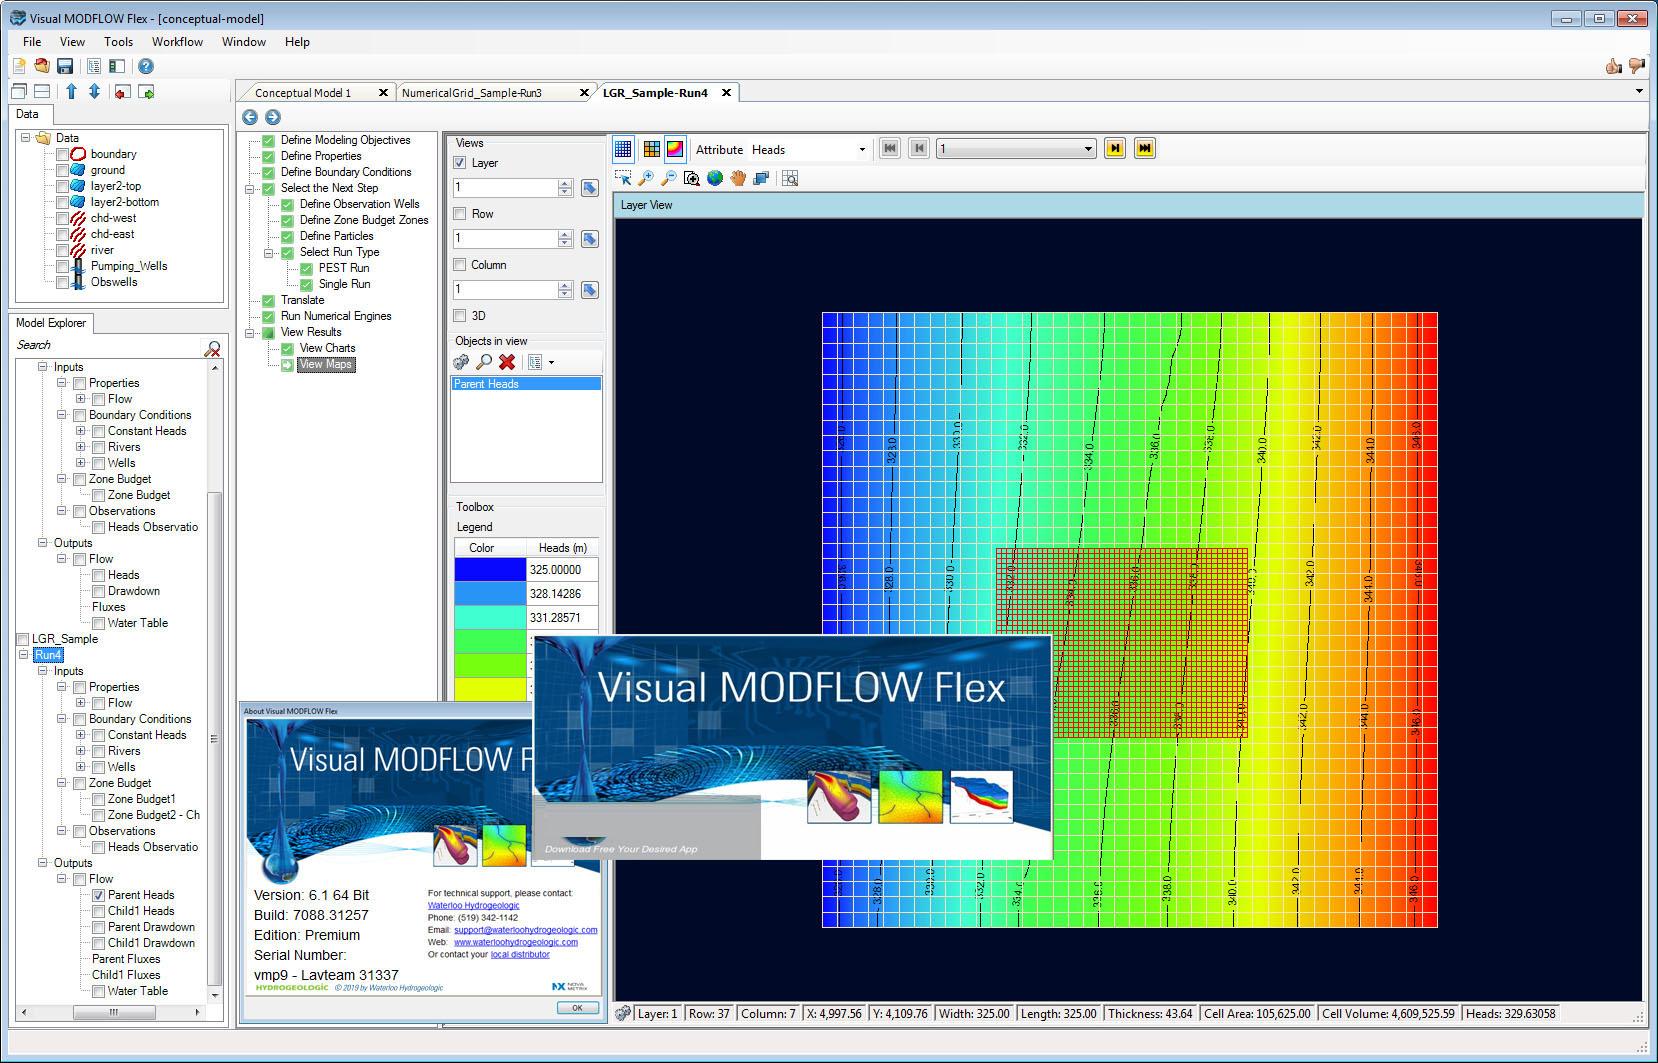 Working with Waterloo Hydrogeologic Visual MODFLOW Flex 6.1 full license